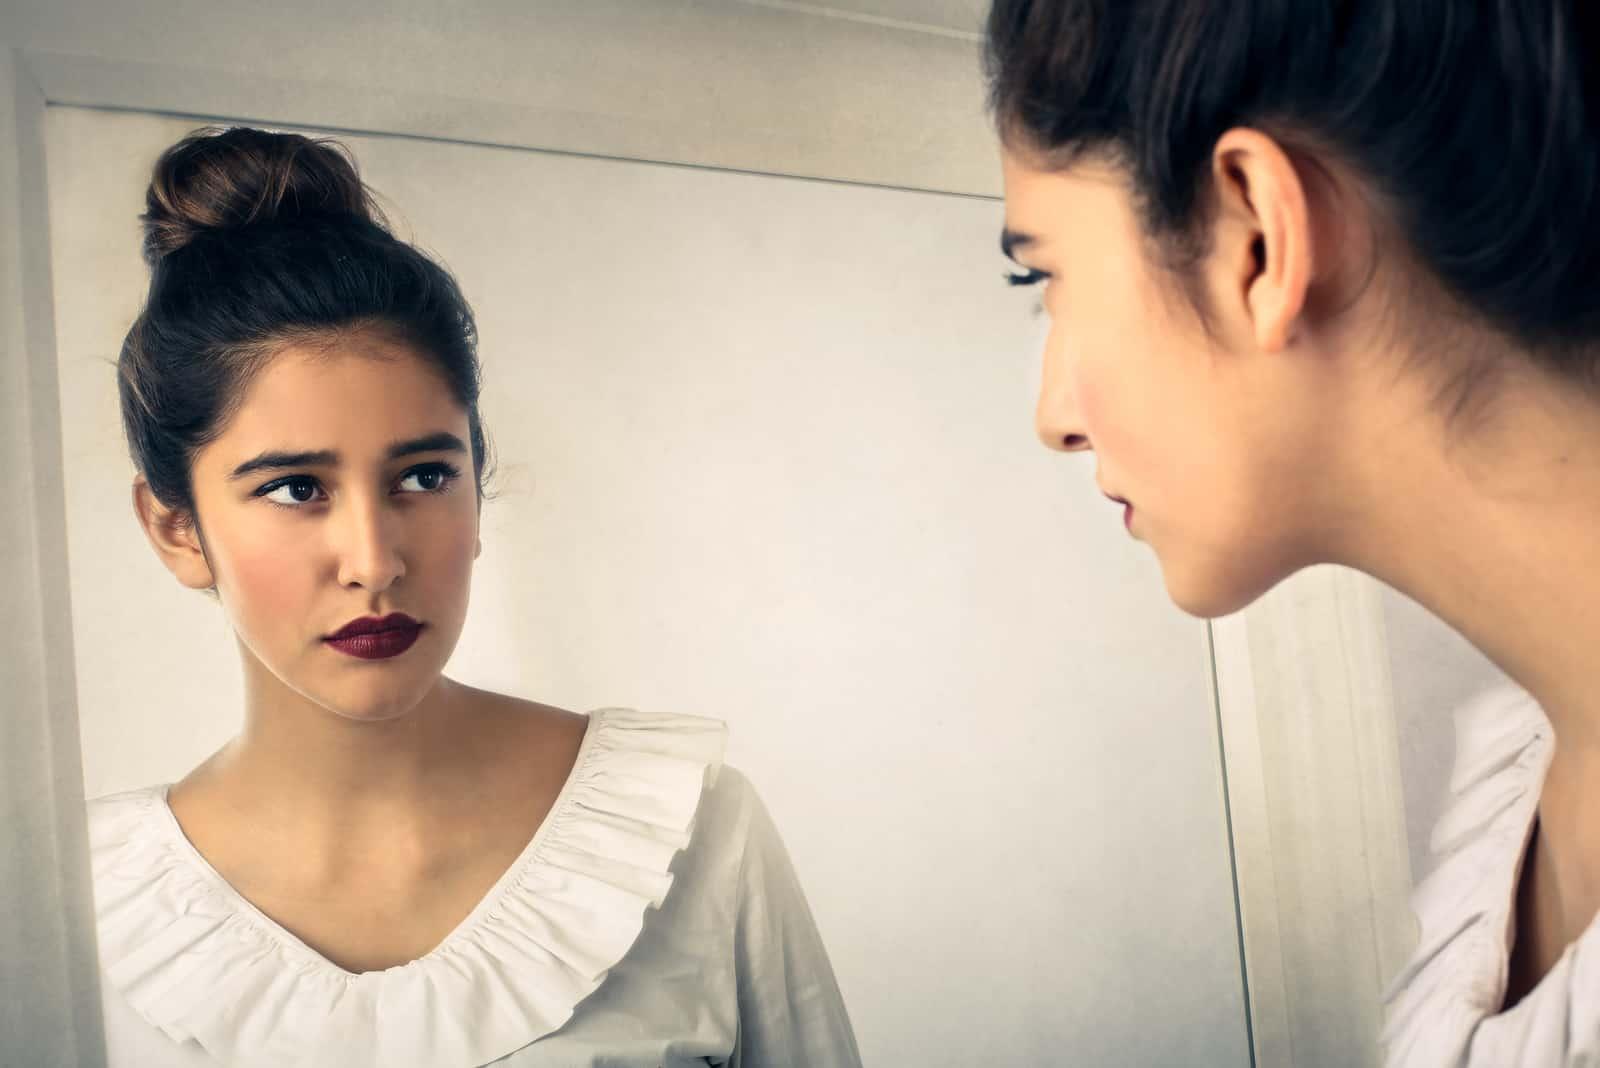 Regardant dans le miroir